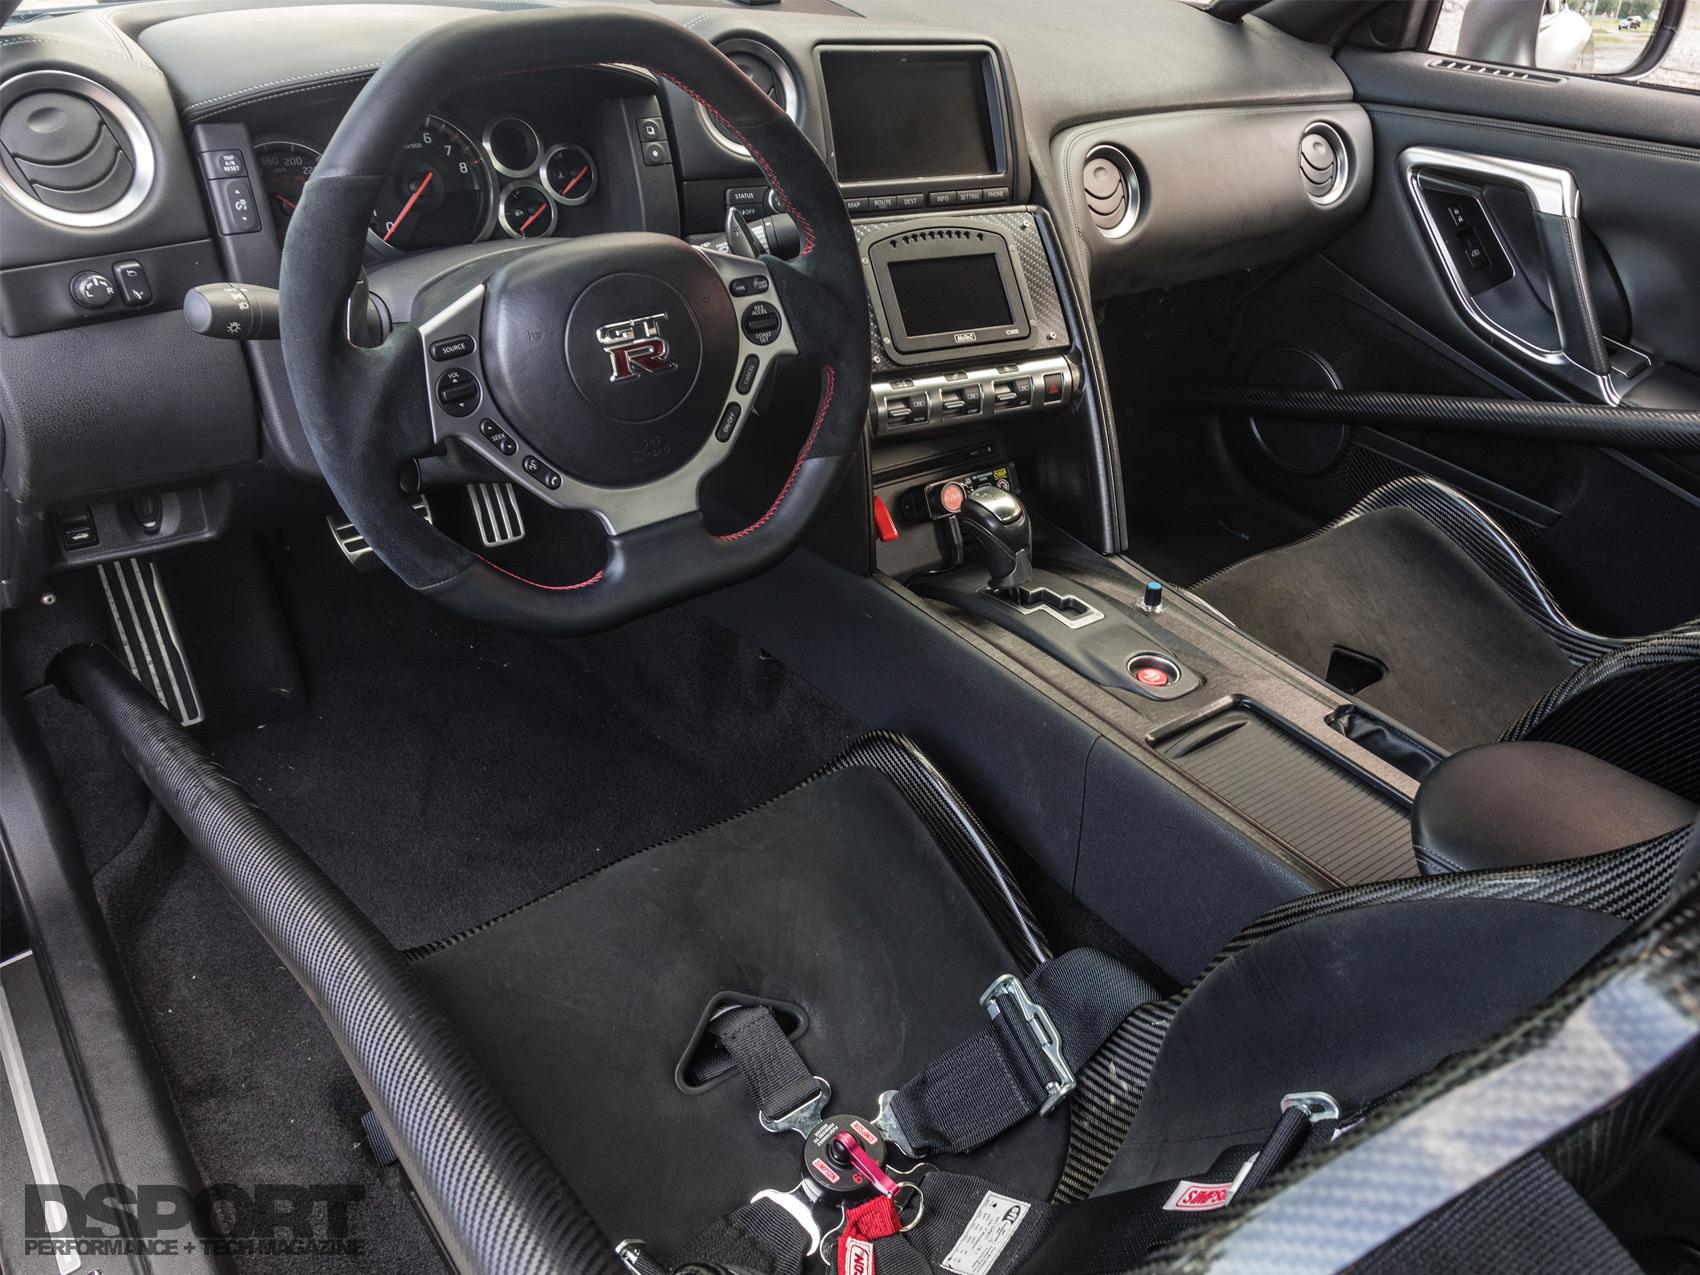 T1 GTR Interior Shot